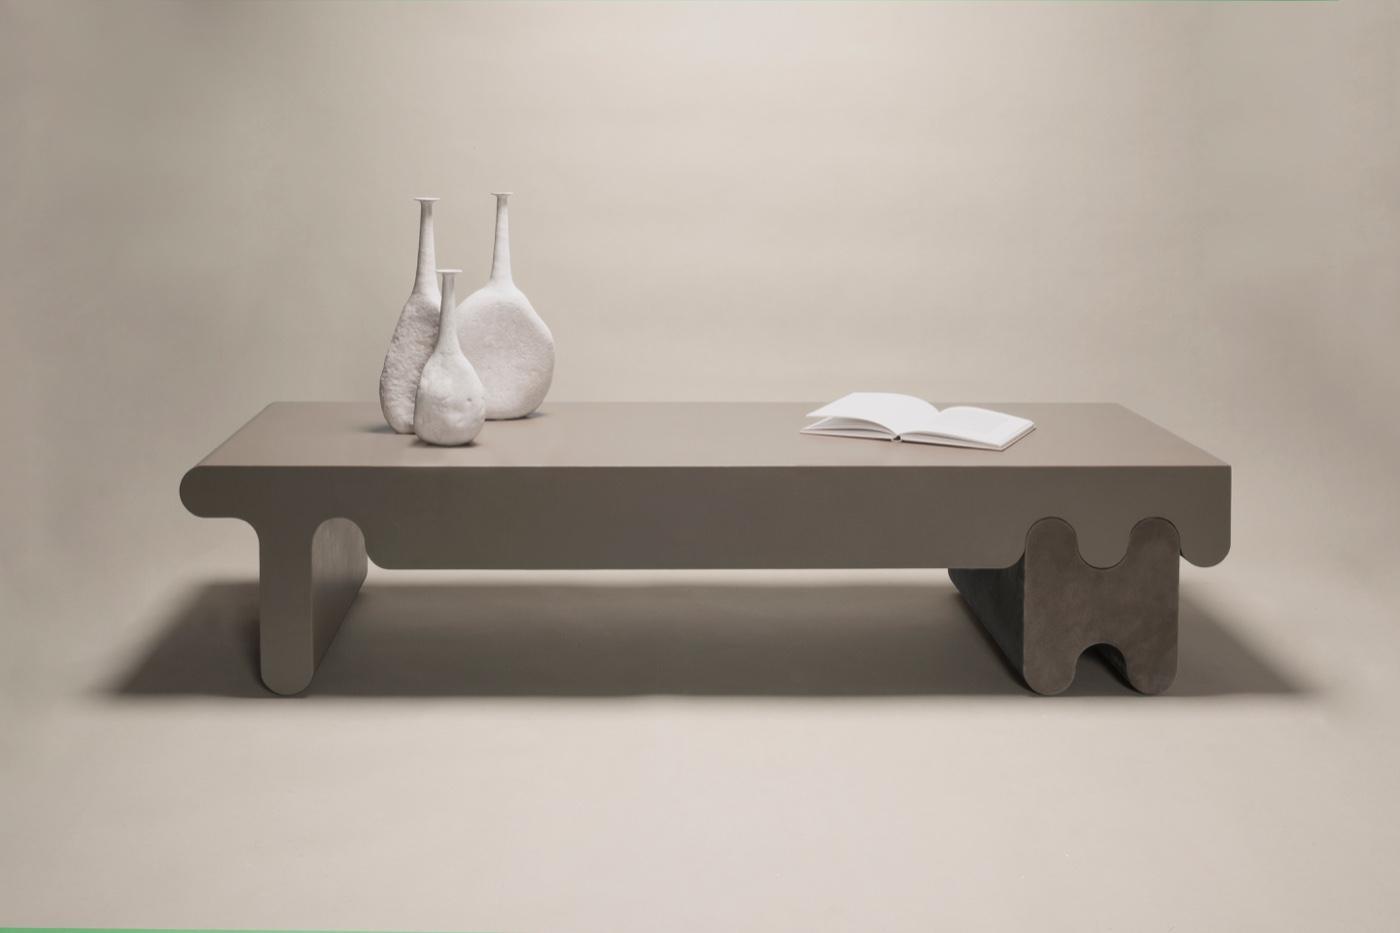 Sculptural Furniture-Image-3